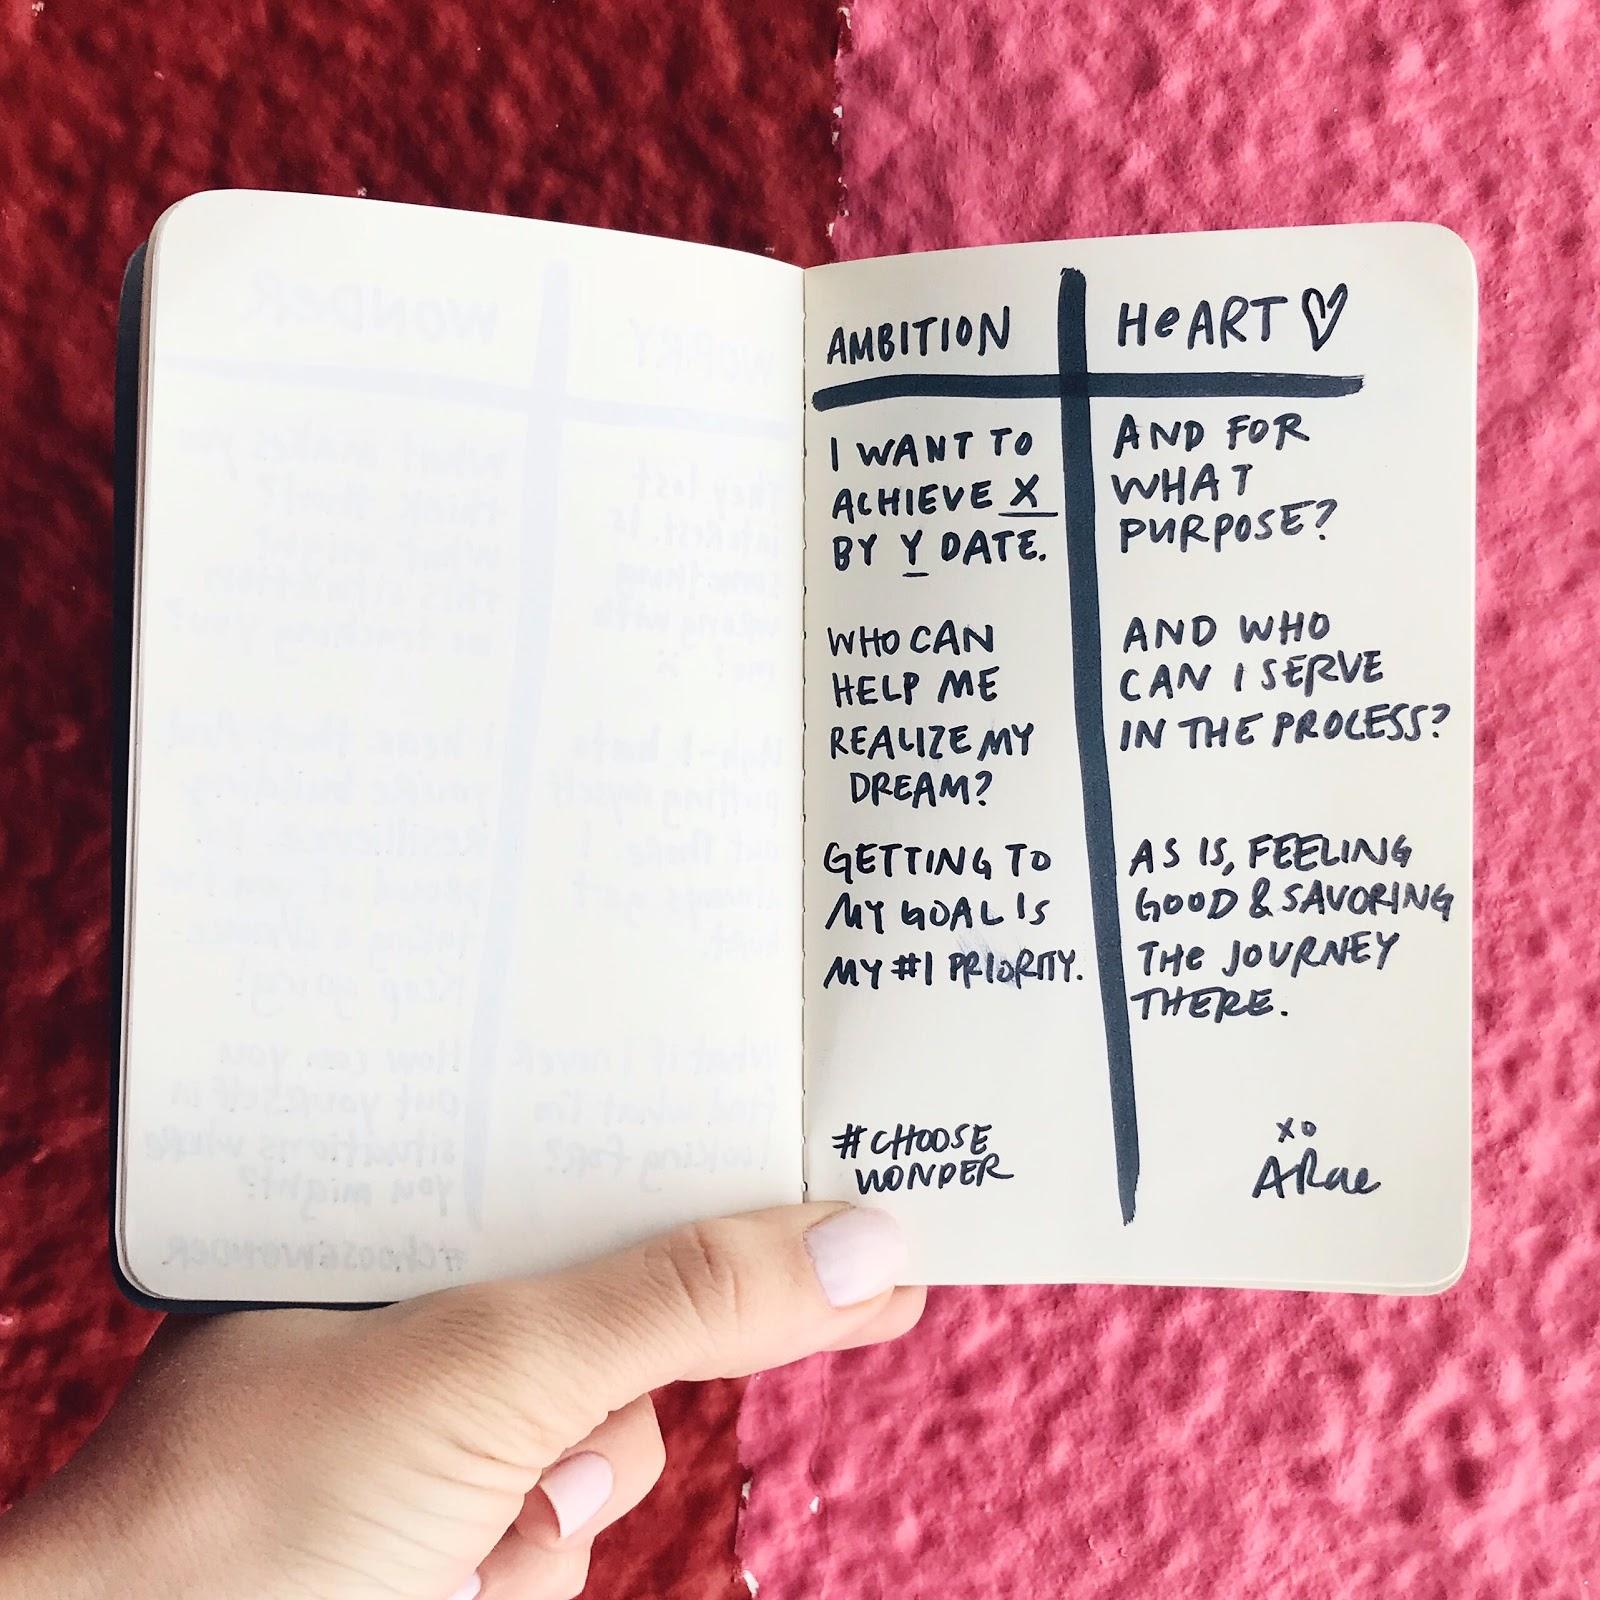 Ambition v Heart.JPG